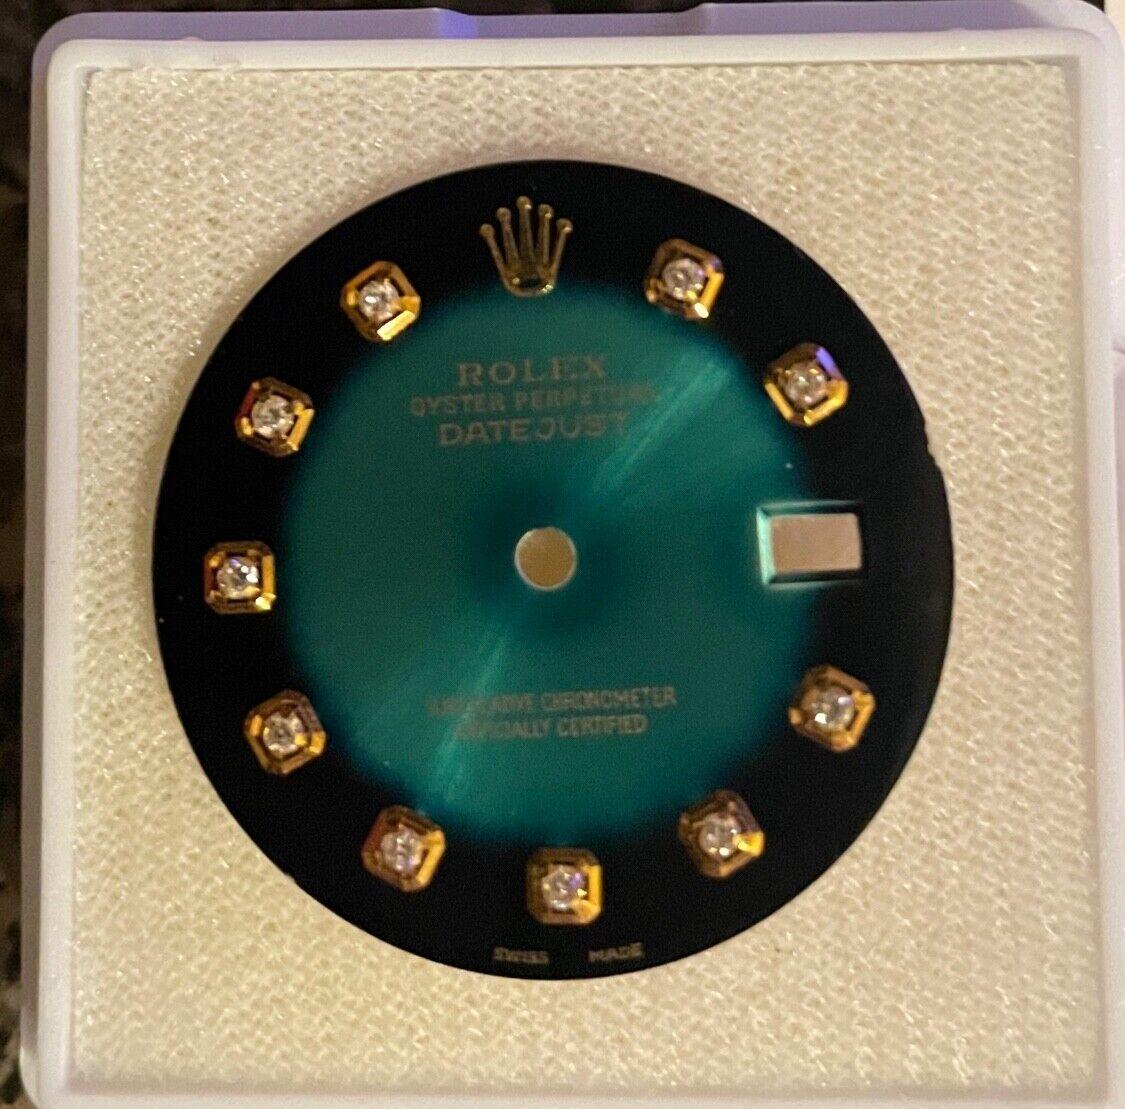 Rolex Datejust 36mm Dial Diamond - $76.00